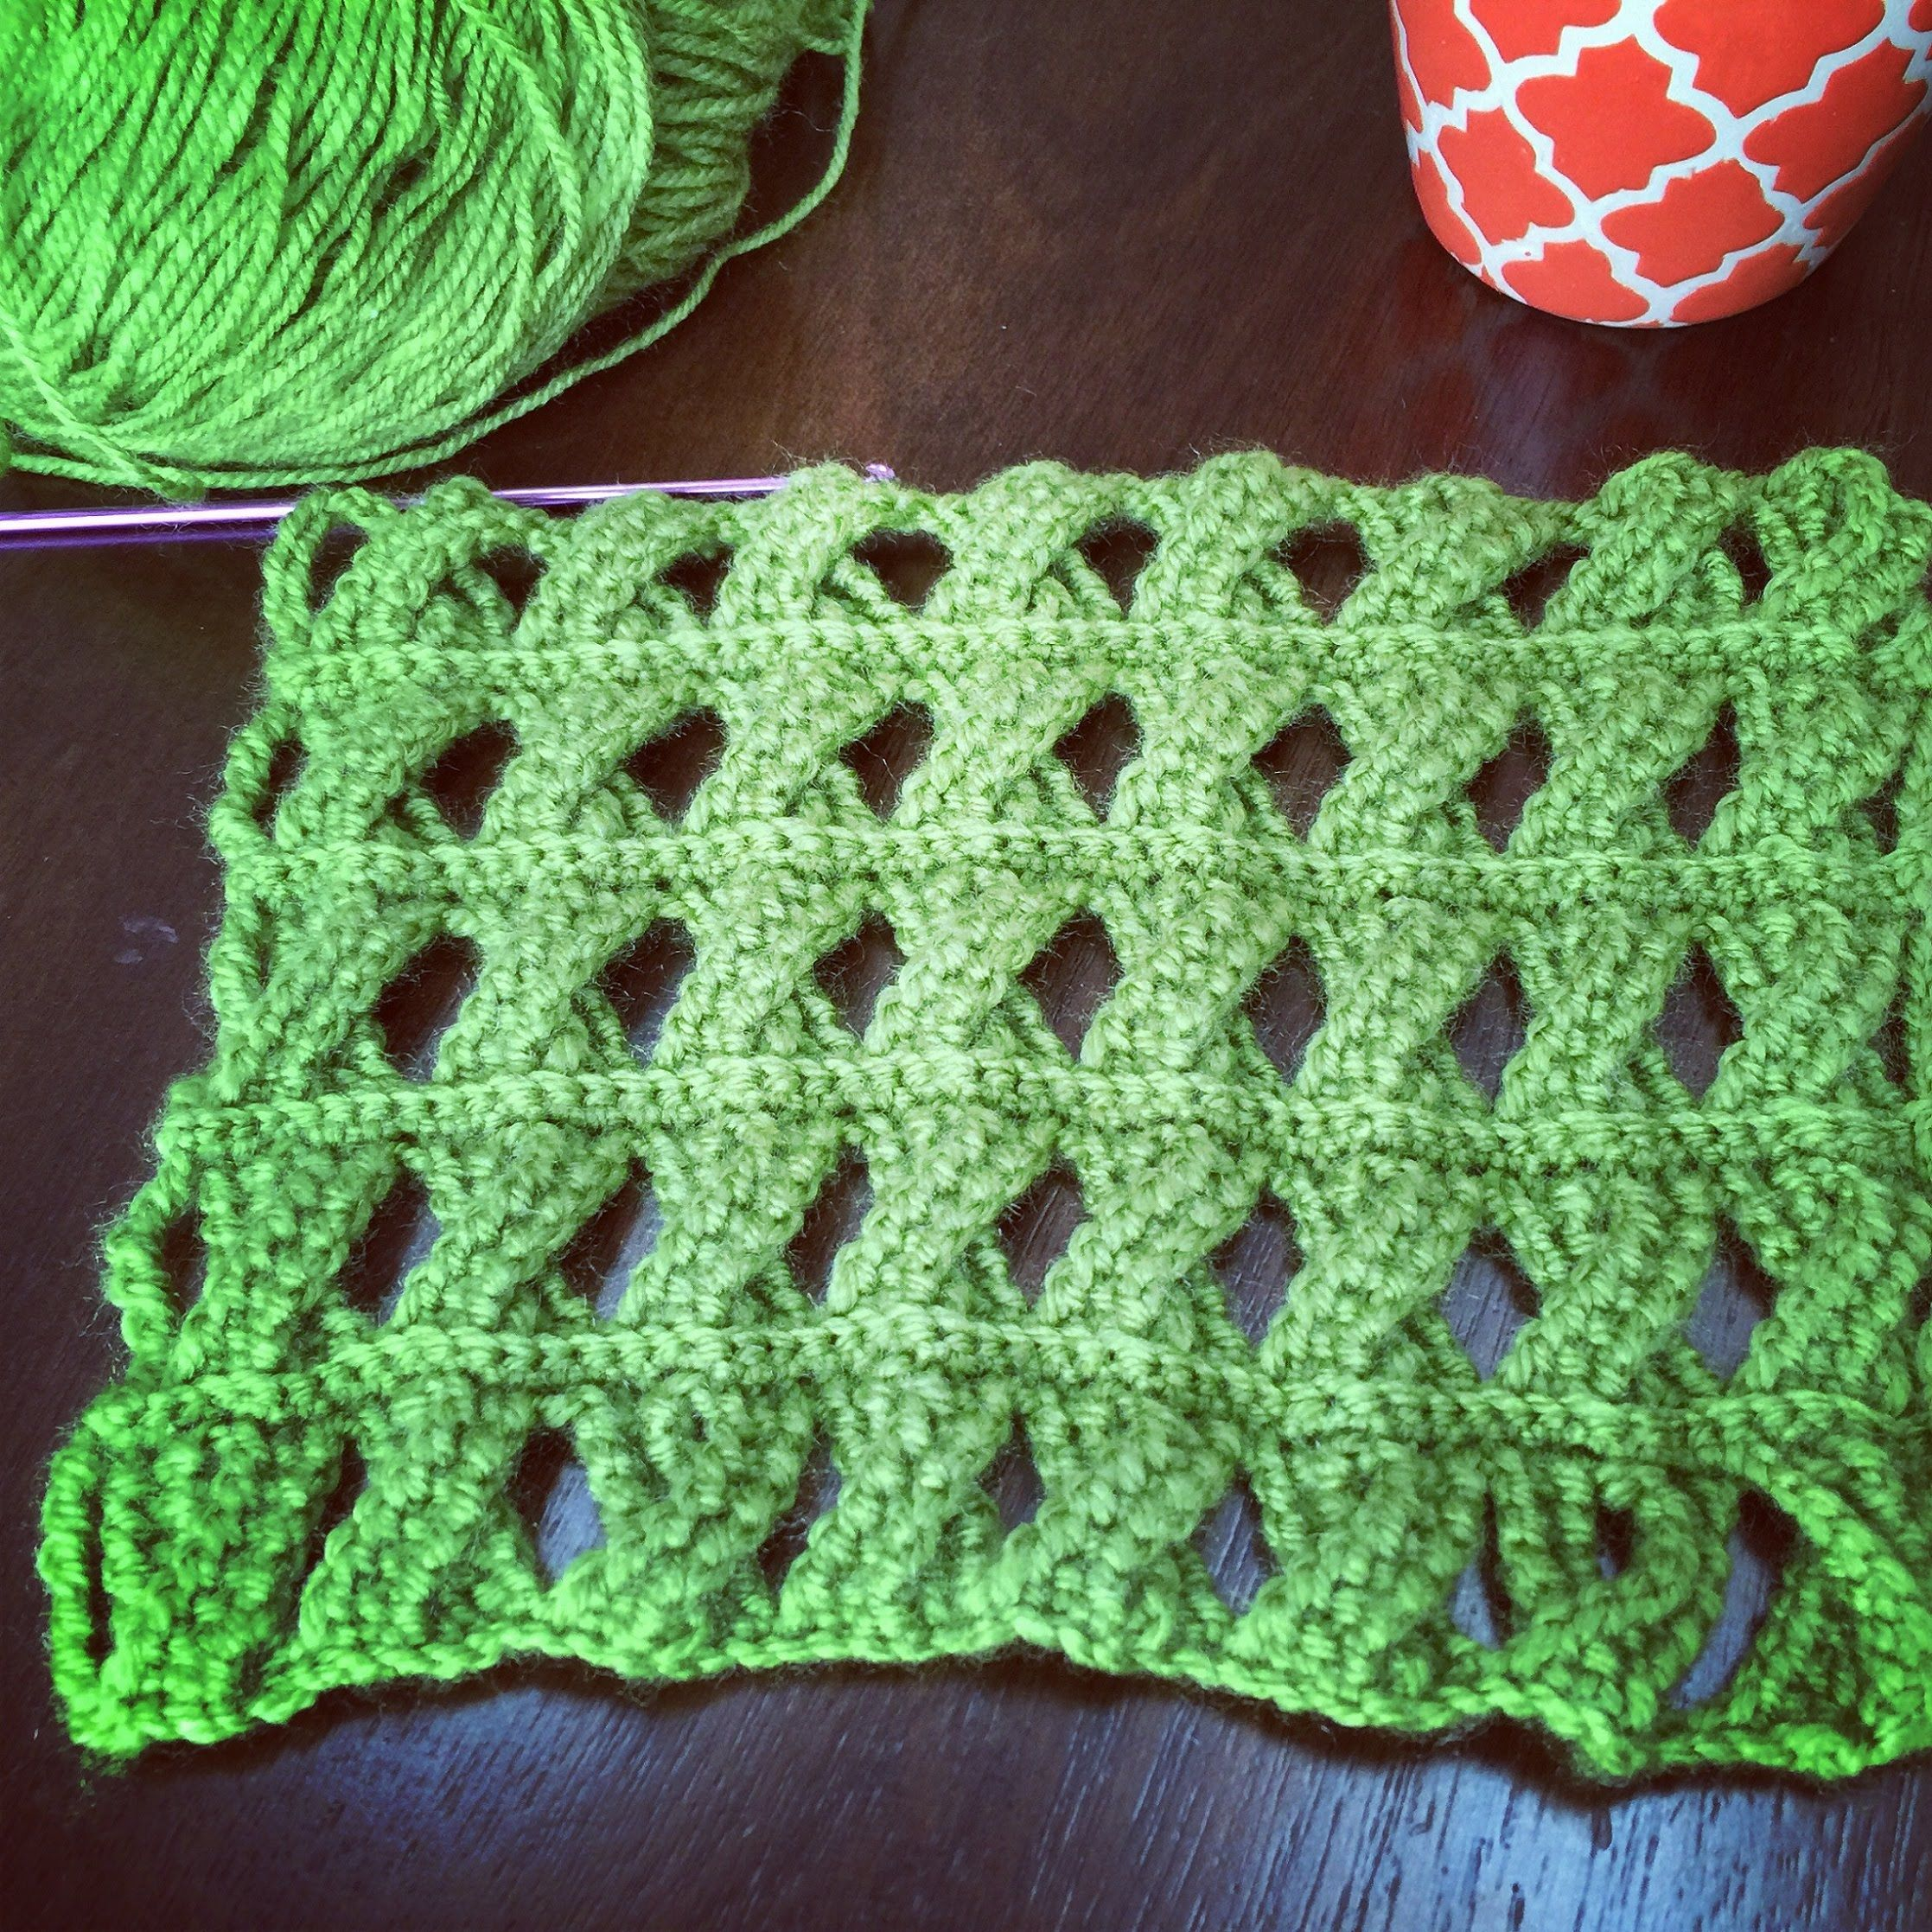 Crochet Pattern - Cable Crochet Stitch - Tunisian Crochet ...